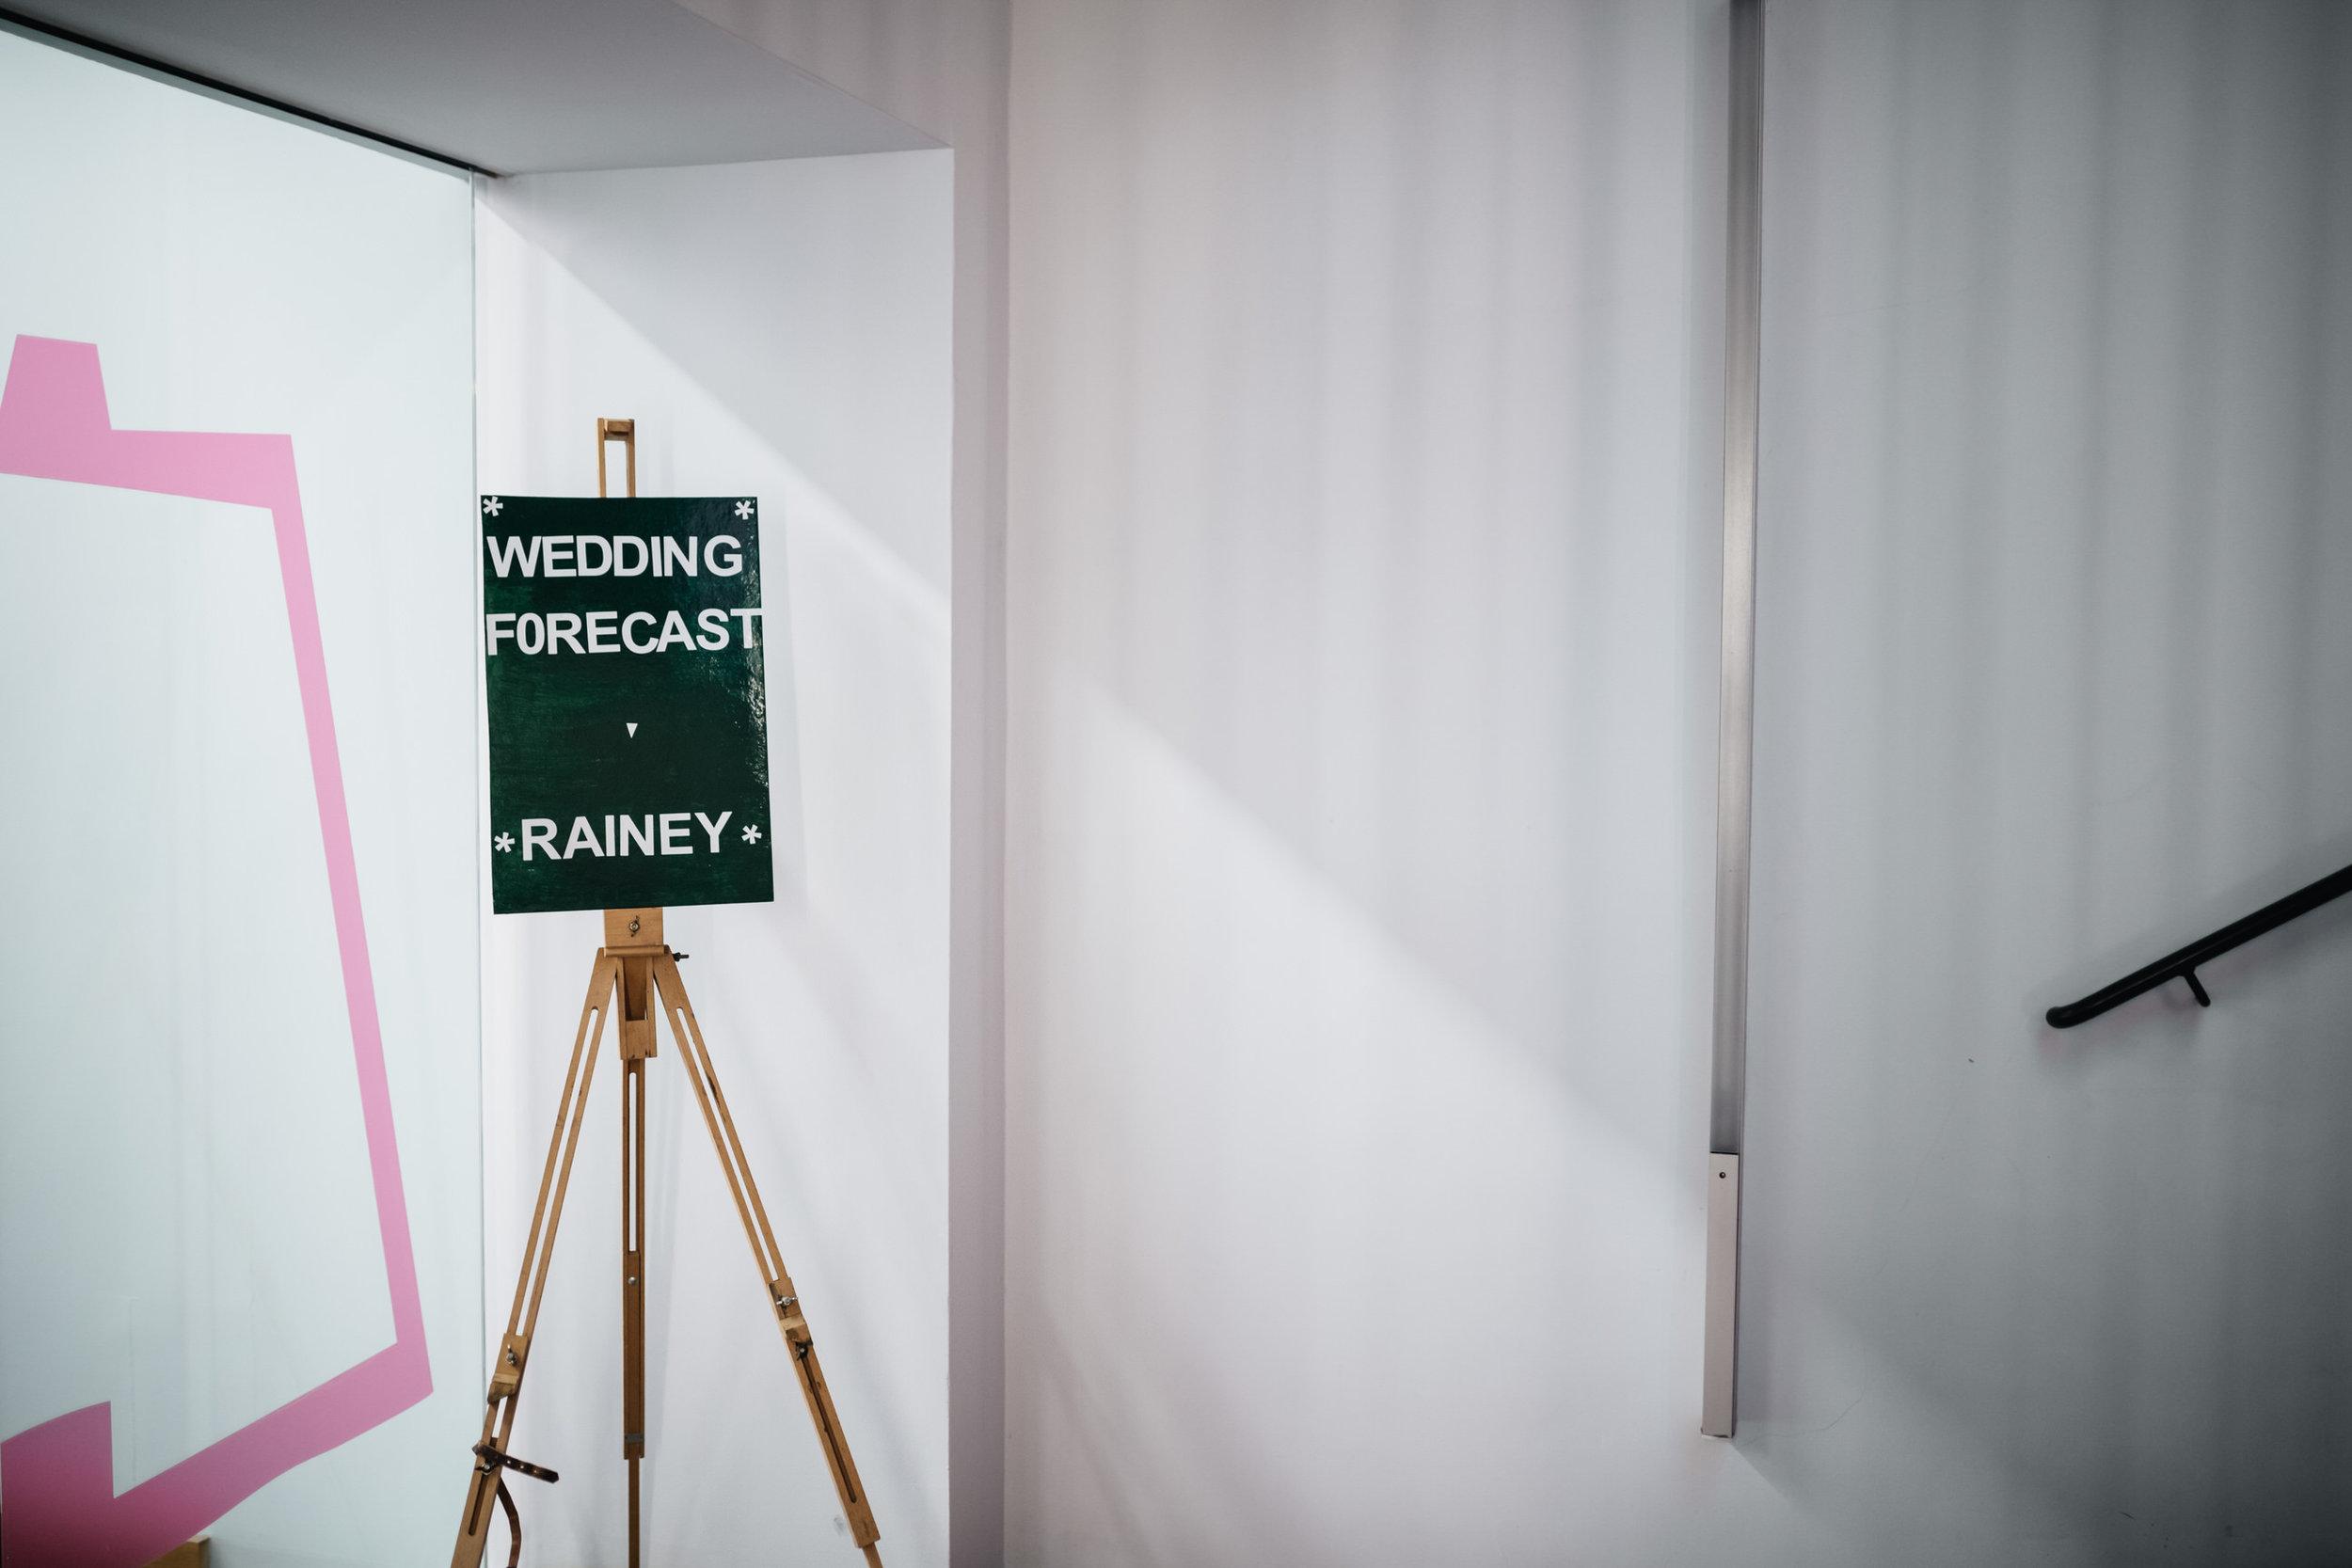 22 -Dovecot-Studios-Wedding-Edinburgh-nameboard.JPG